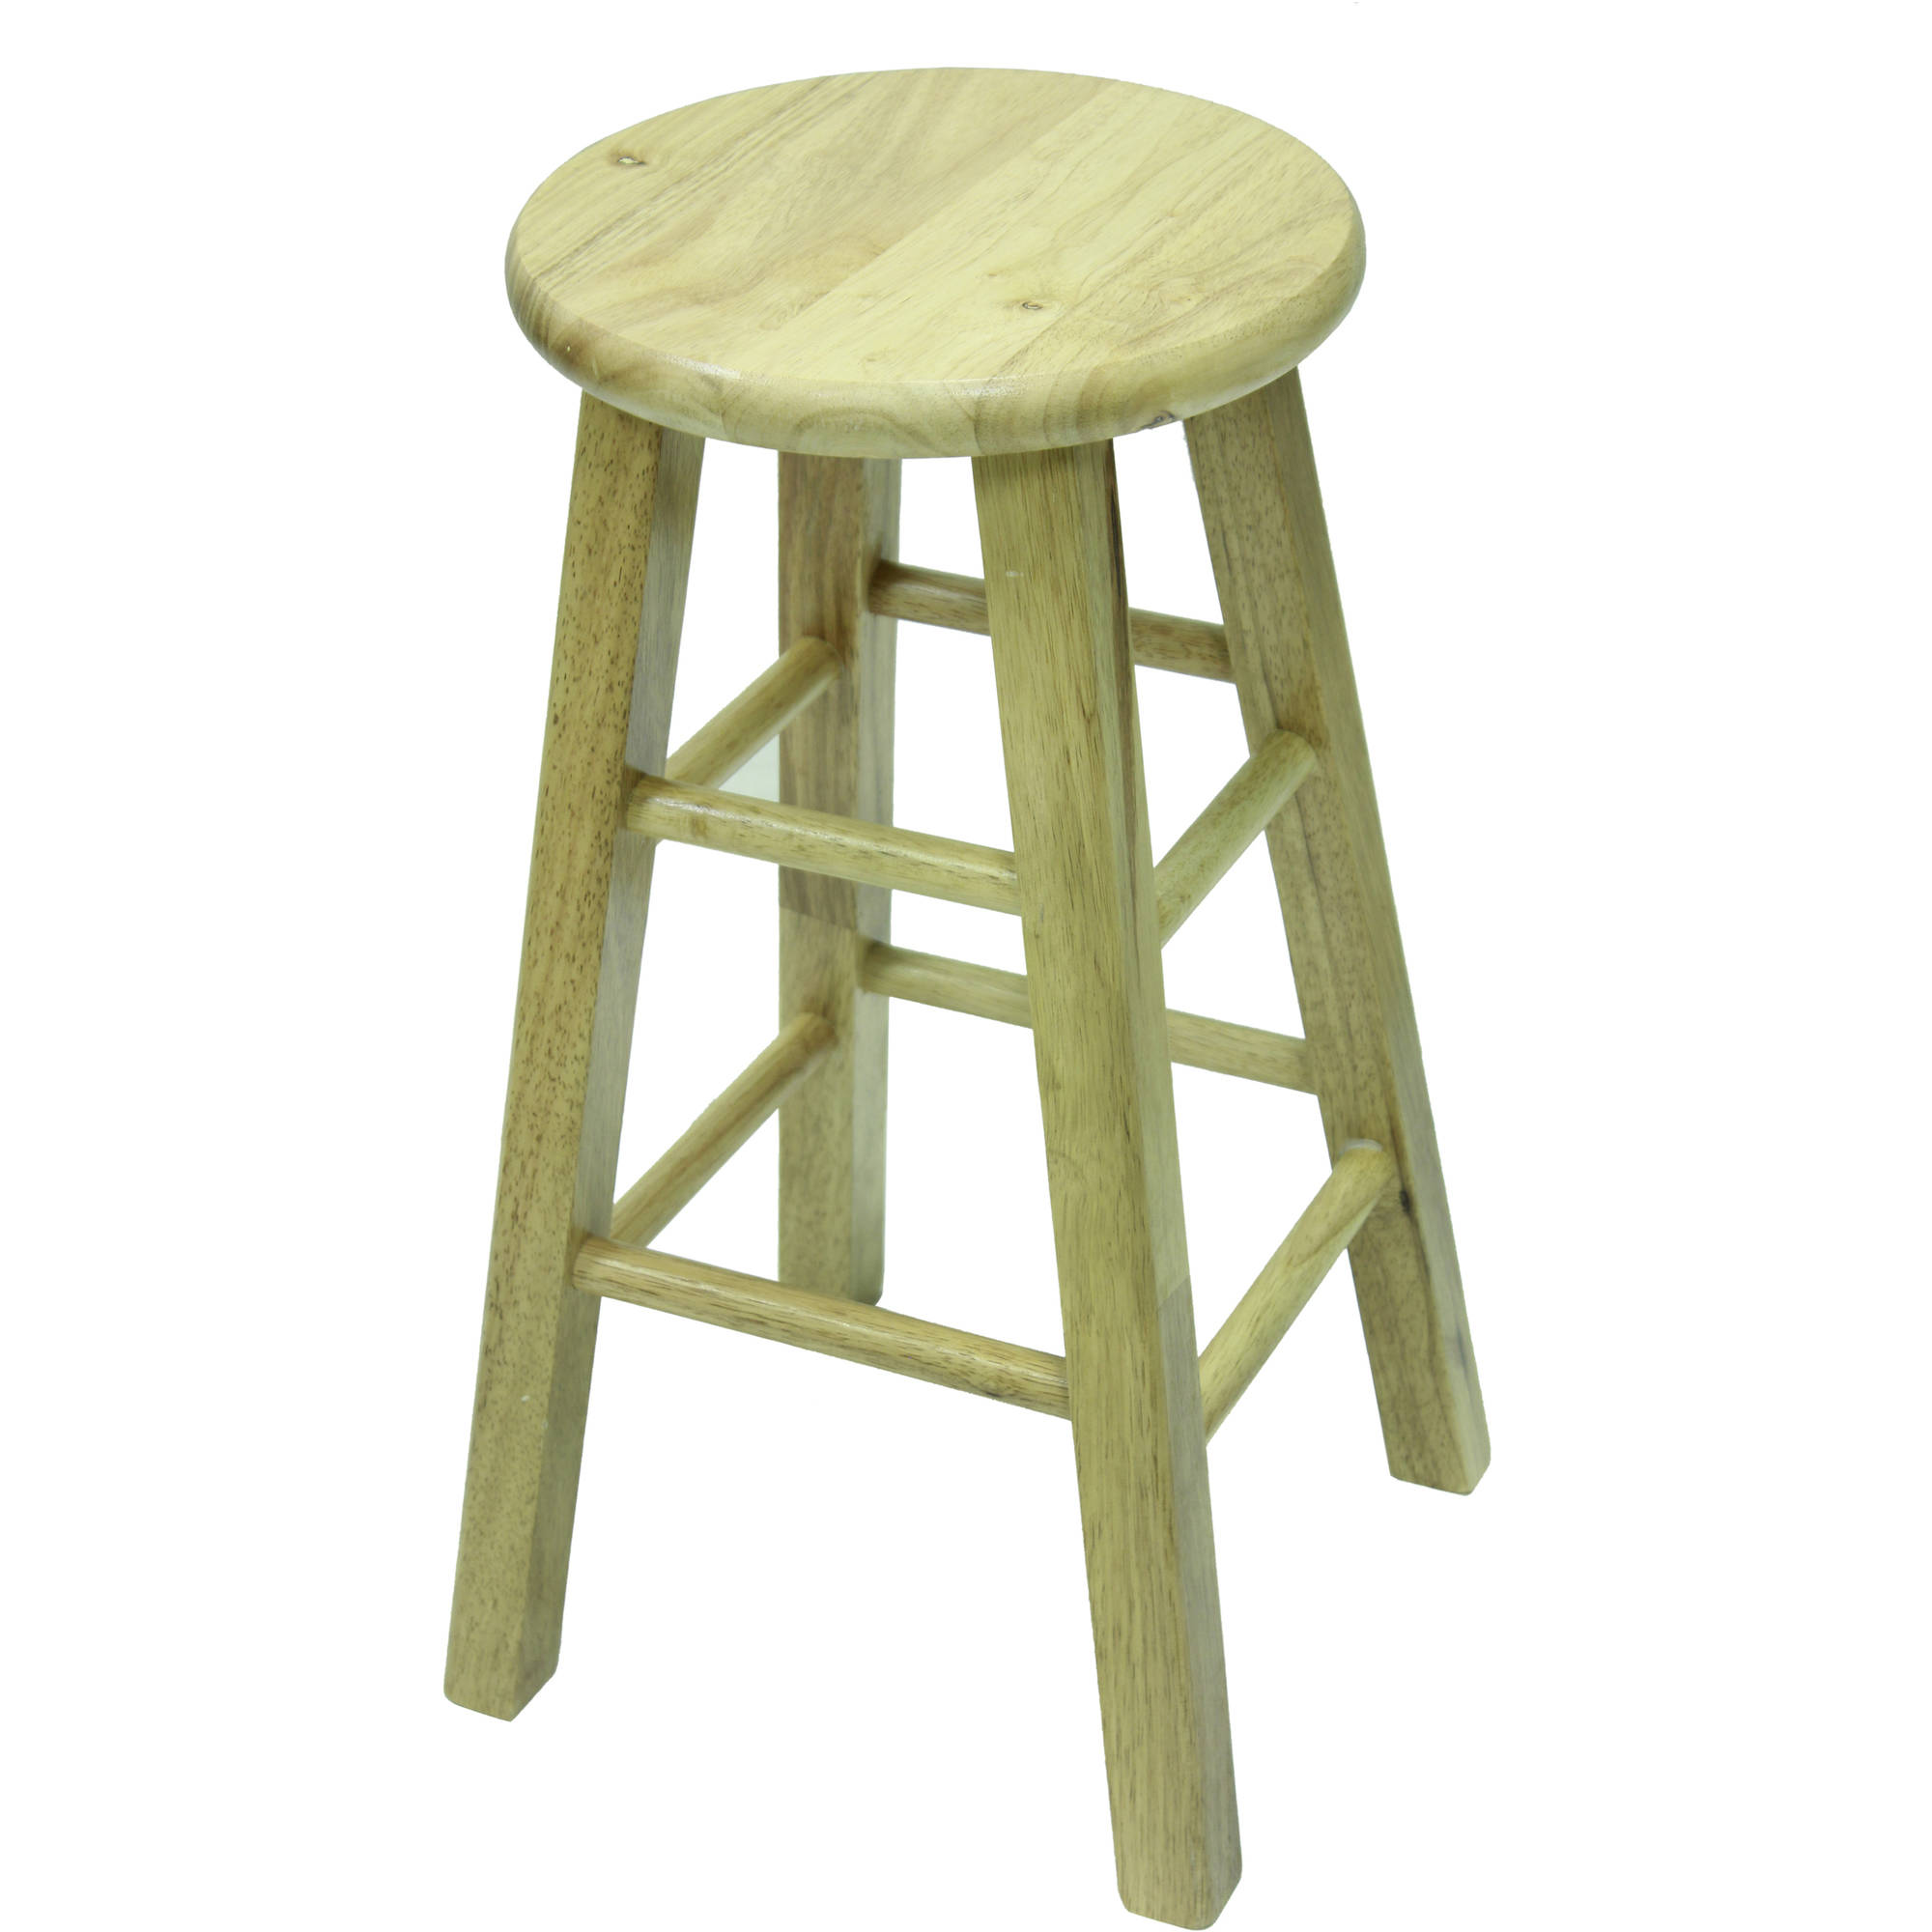 Mainstays 24 Quot Fully Assembled Natural Wood Barstool